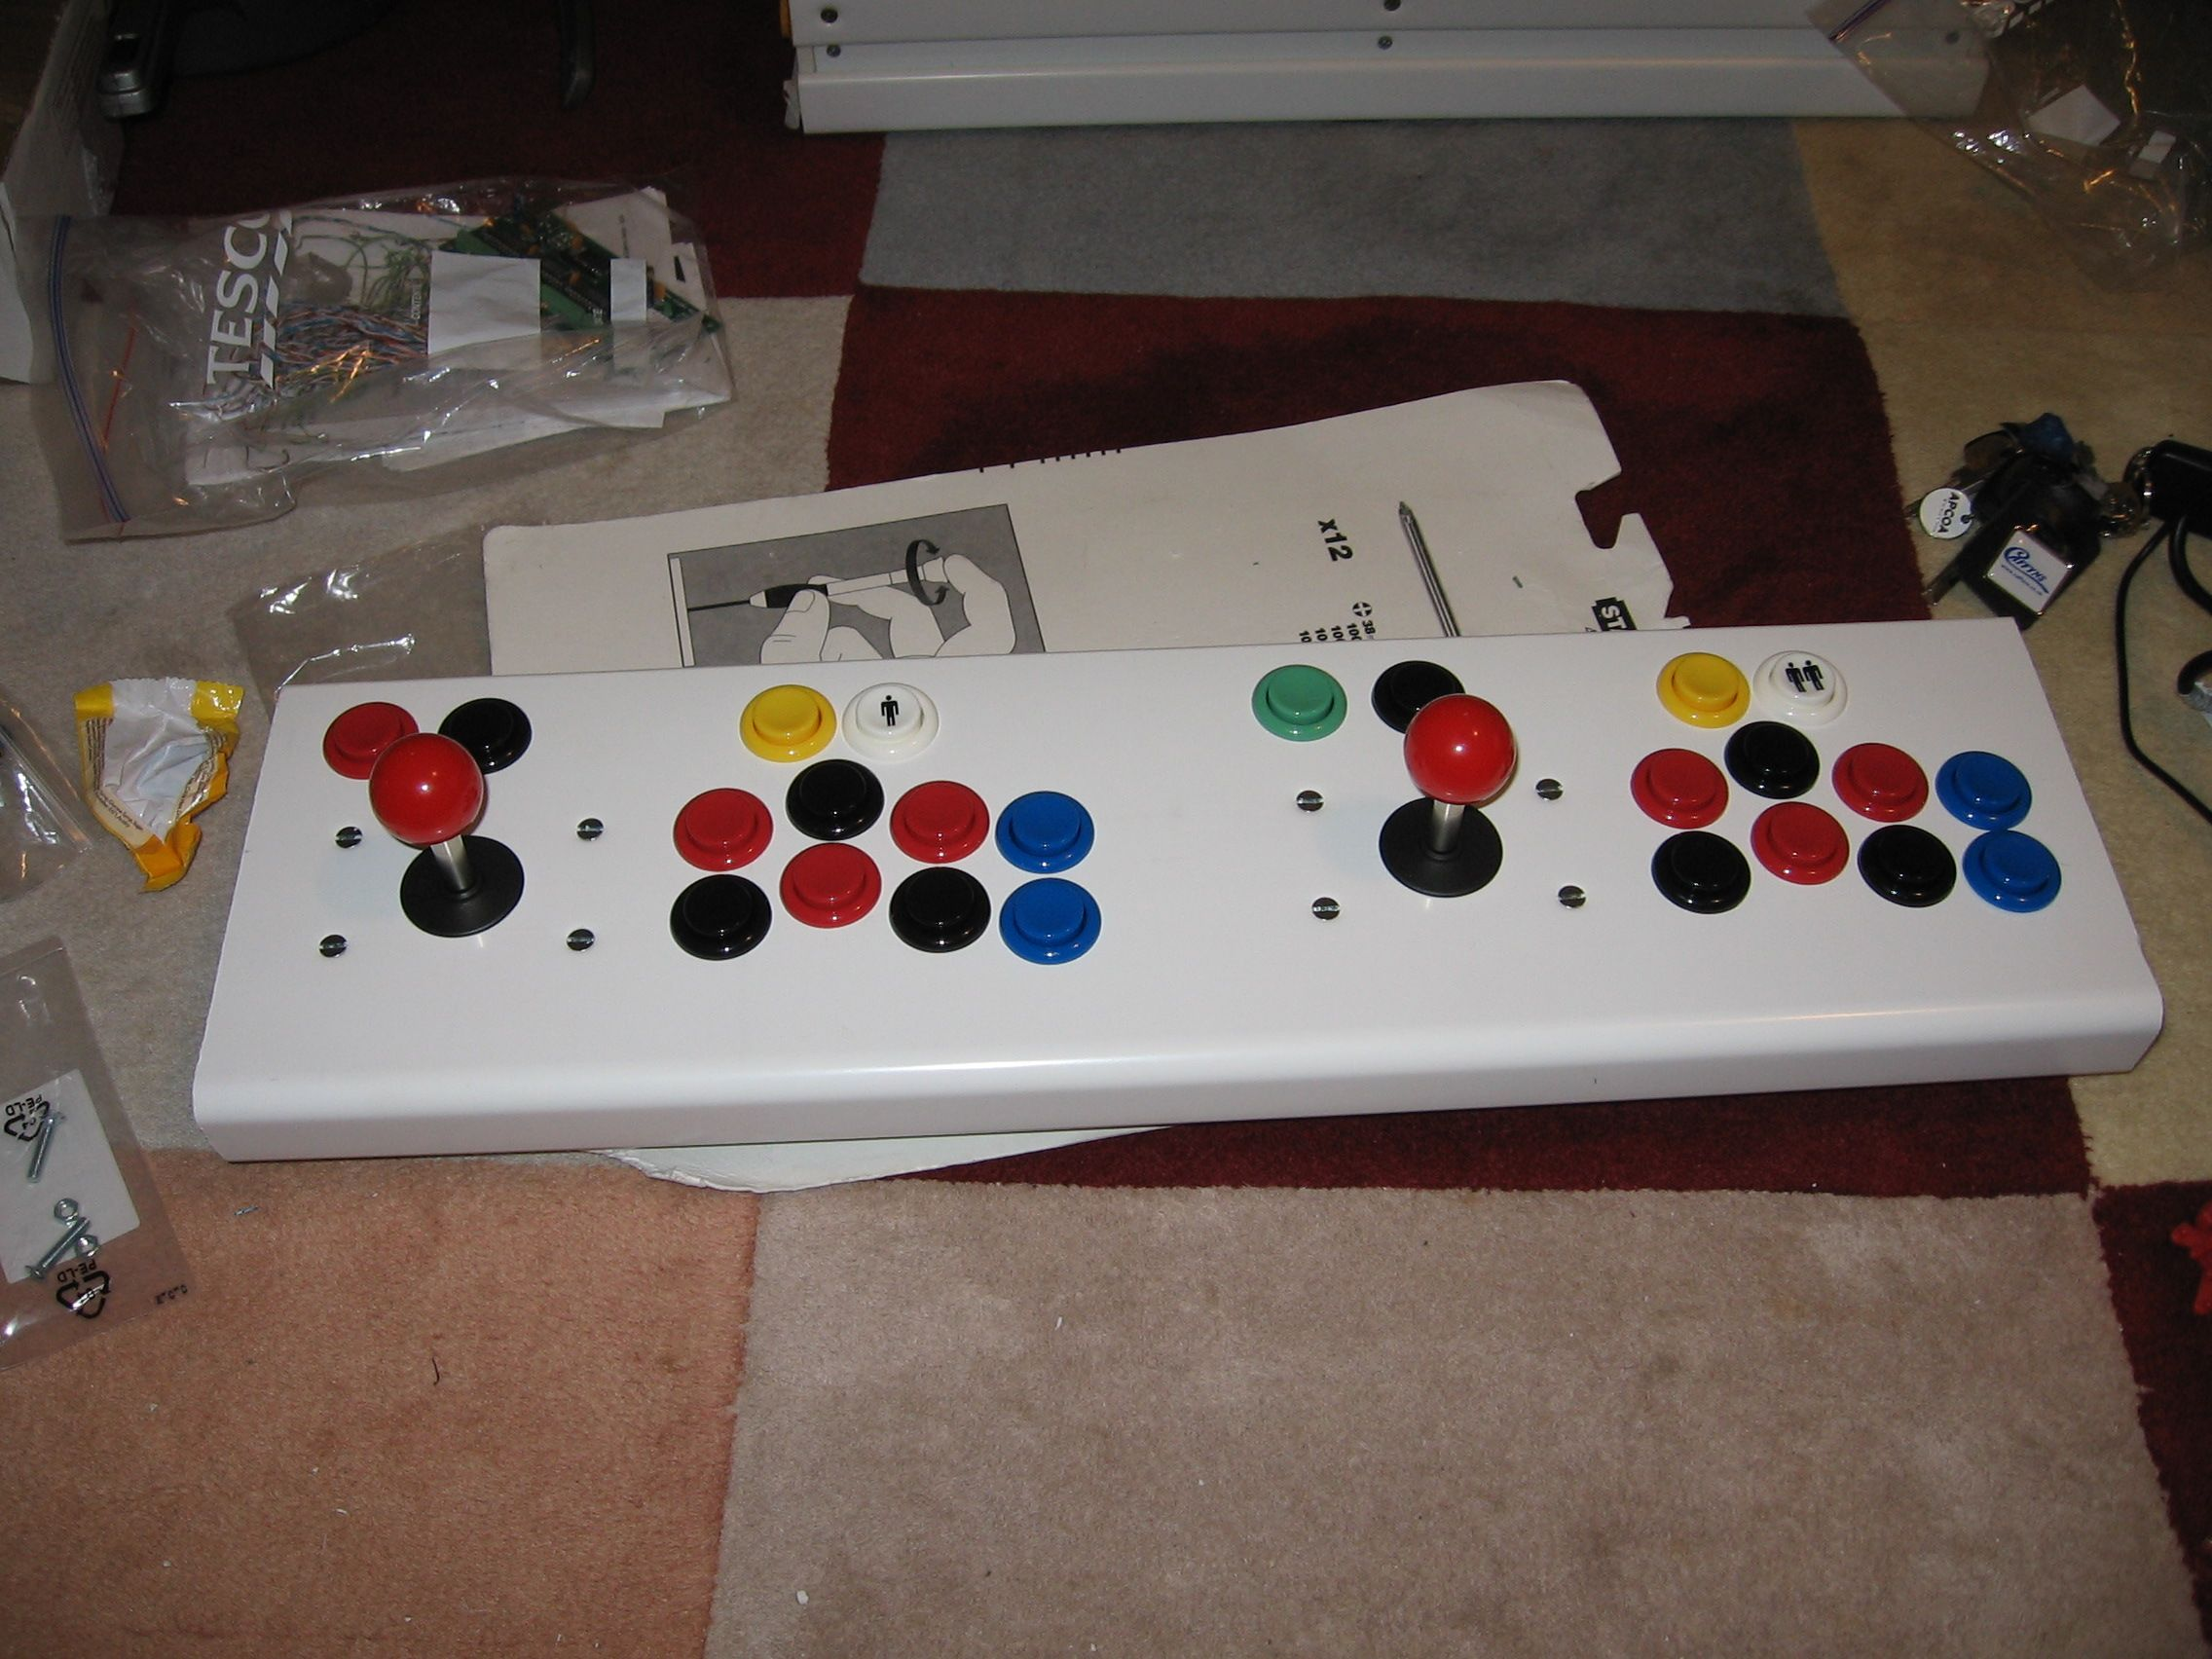 USB Keyboard Controller, Arcade Joystick build, demo with